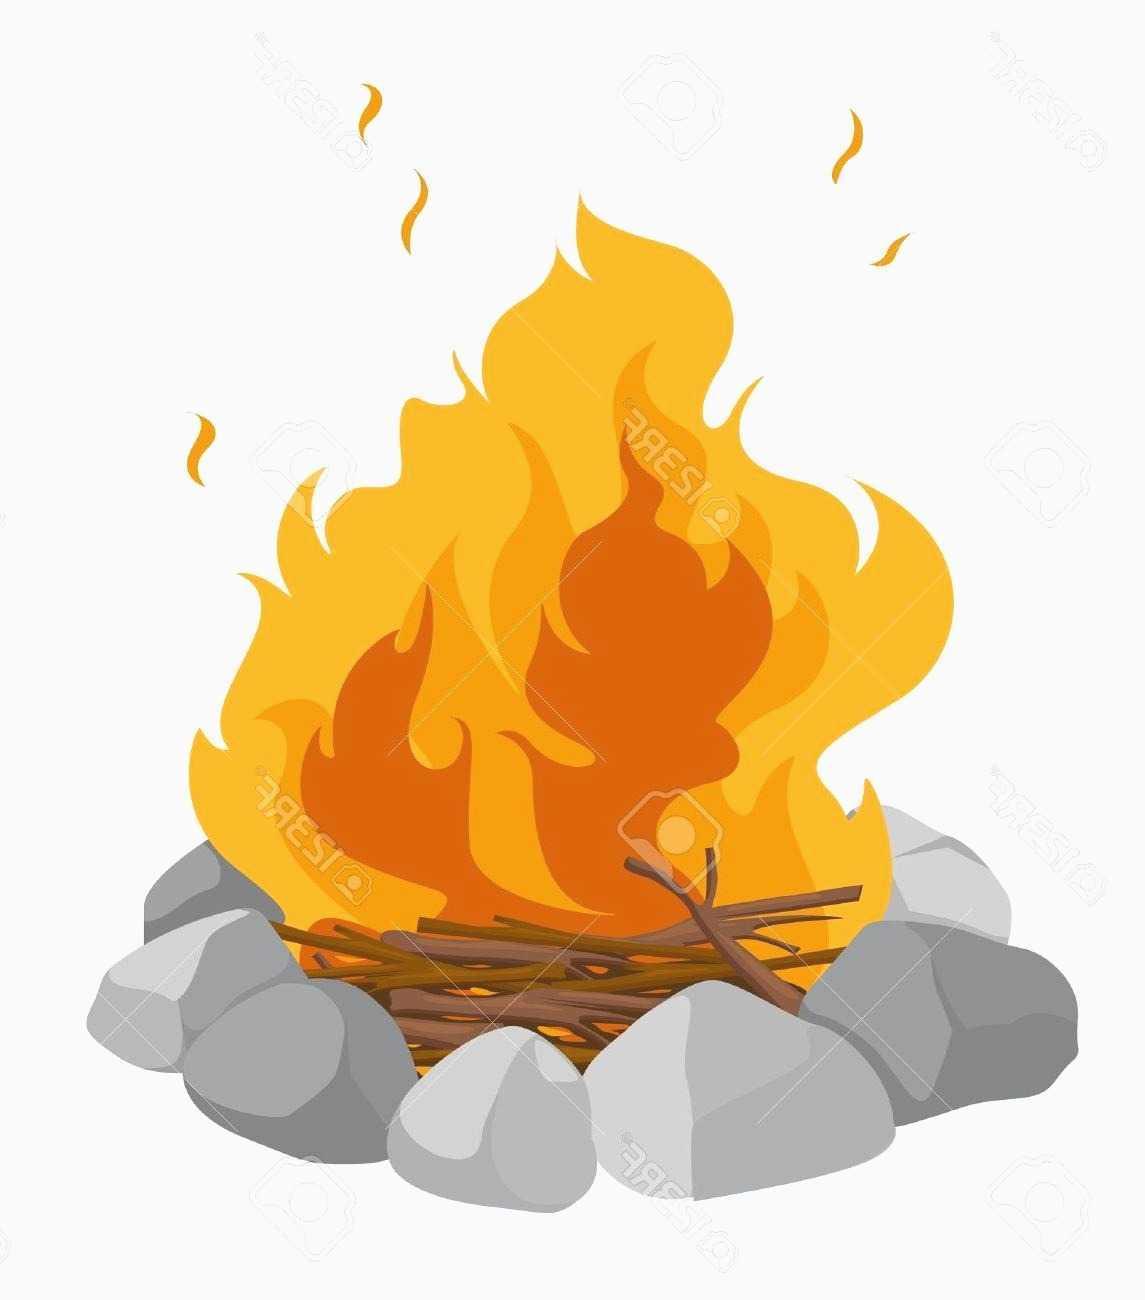 1145x1300 Fire Pit Clipart Free Unique Best Hd Cartoon Campfire Vector